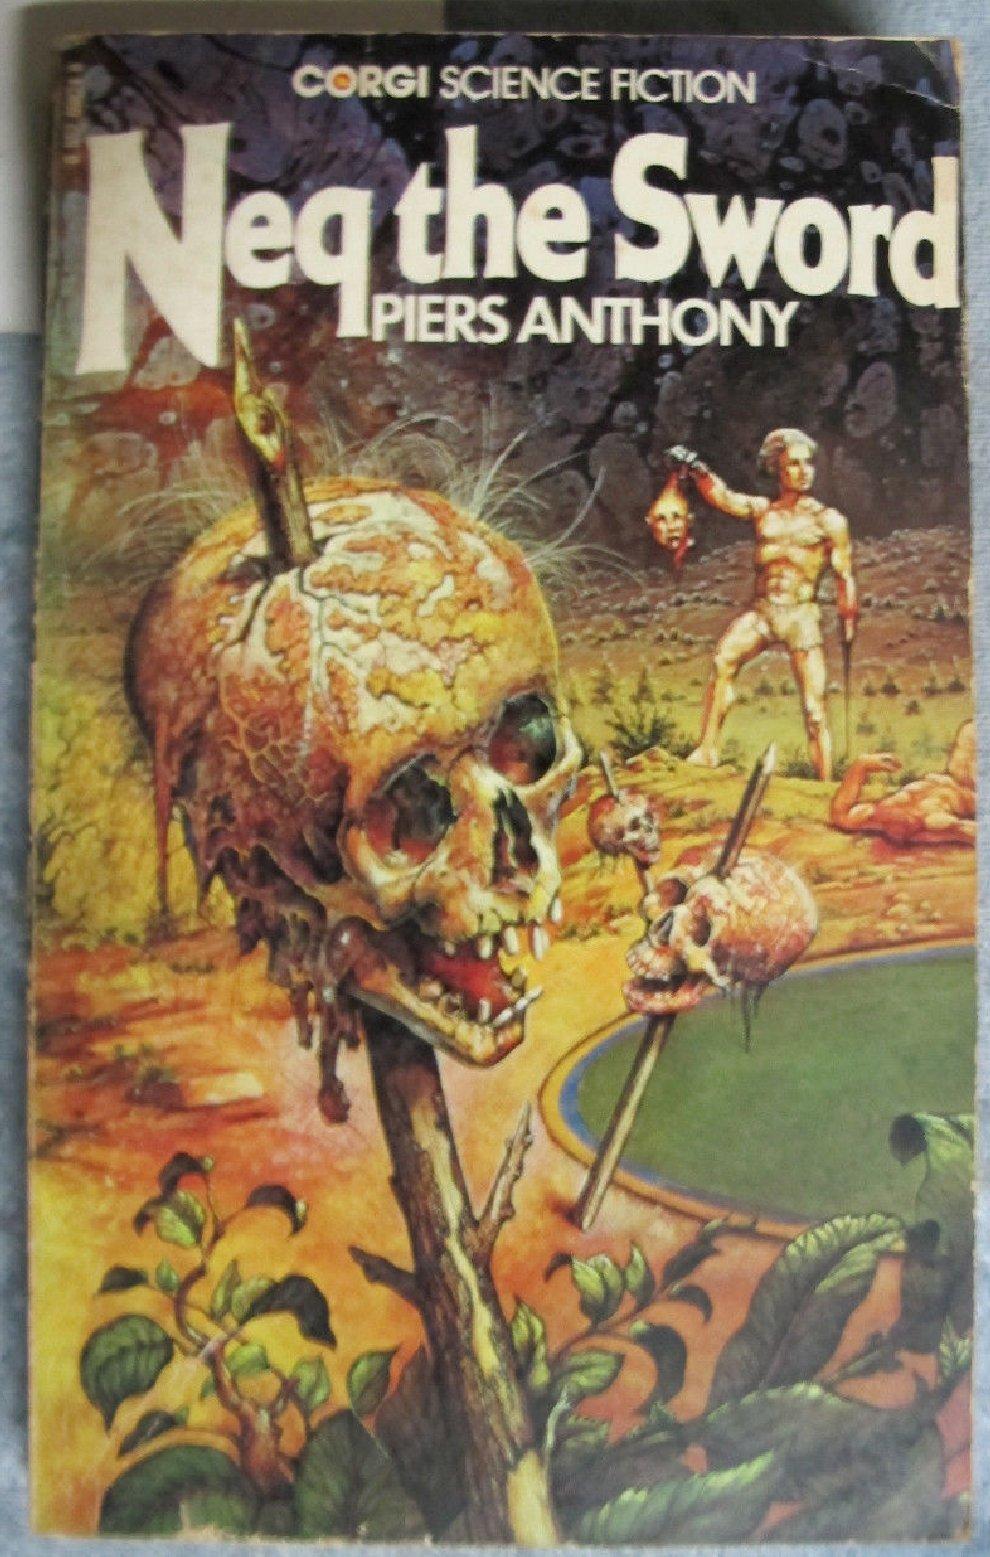 Skulls-a-yappin'